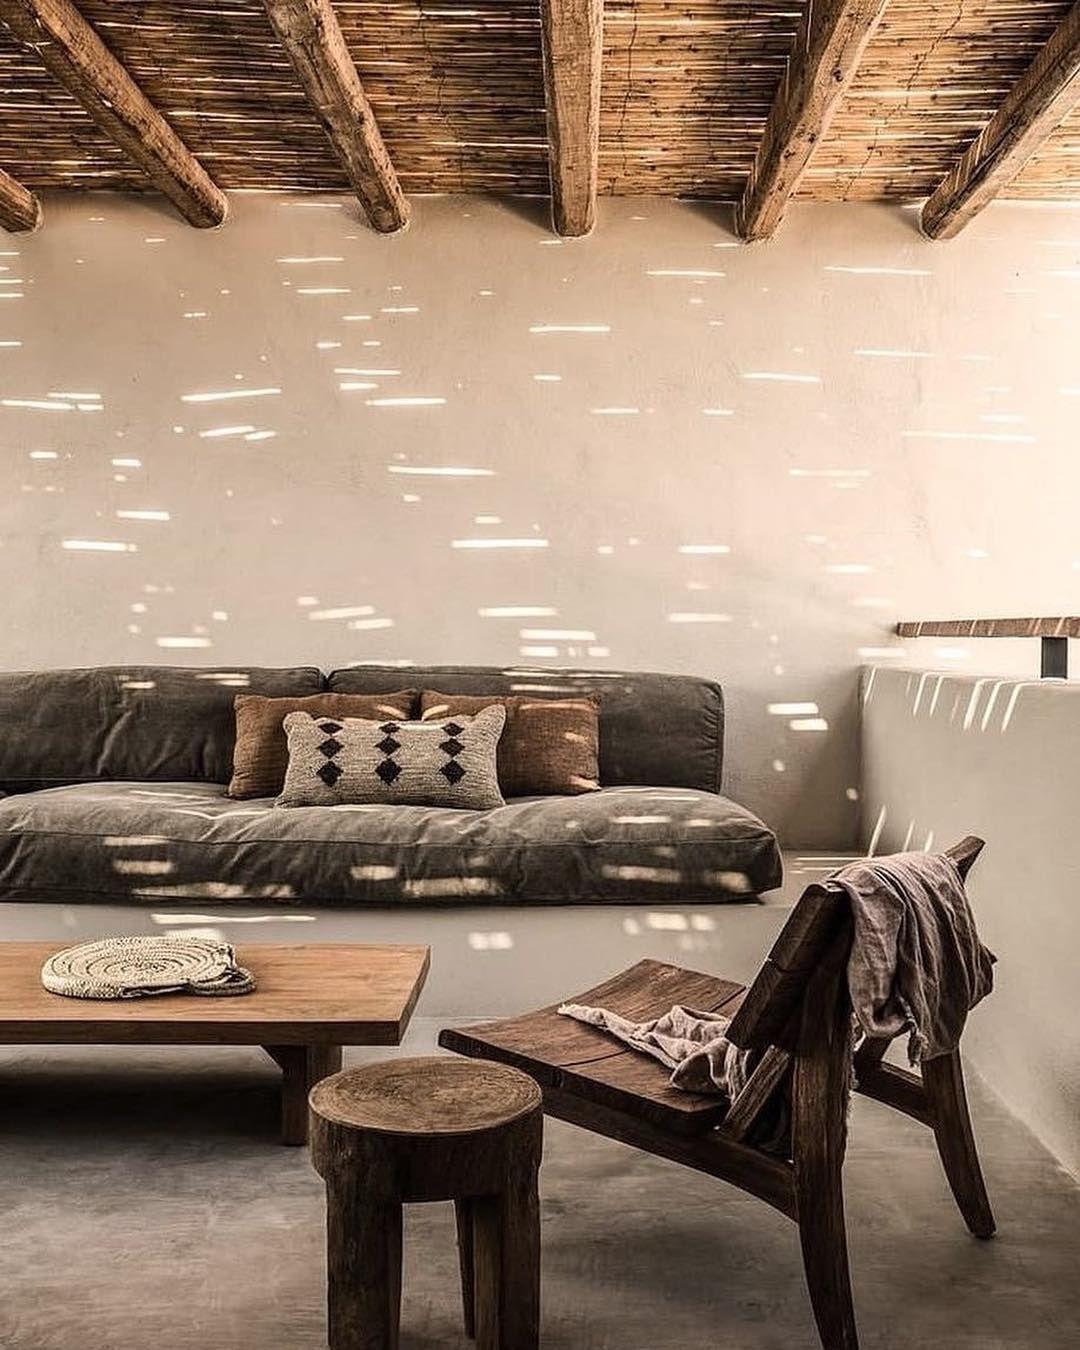 Casa Cook Kos In Marmari Greece By Ilias Mastrominas Annabell